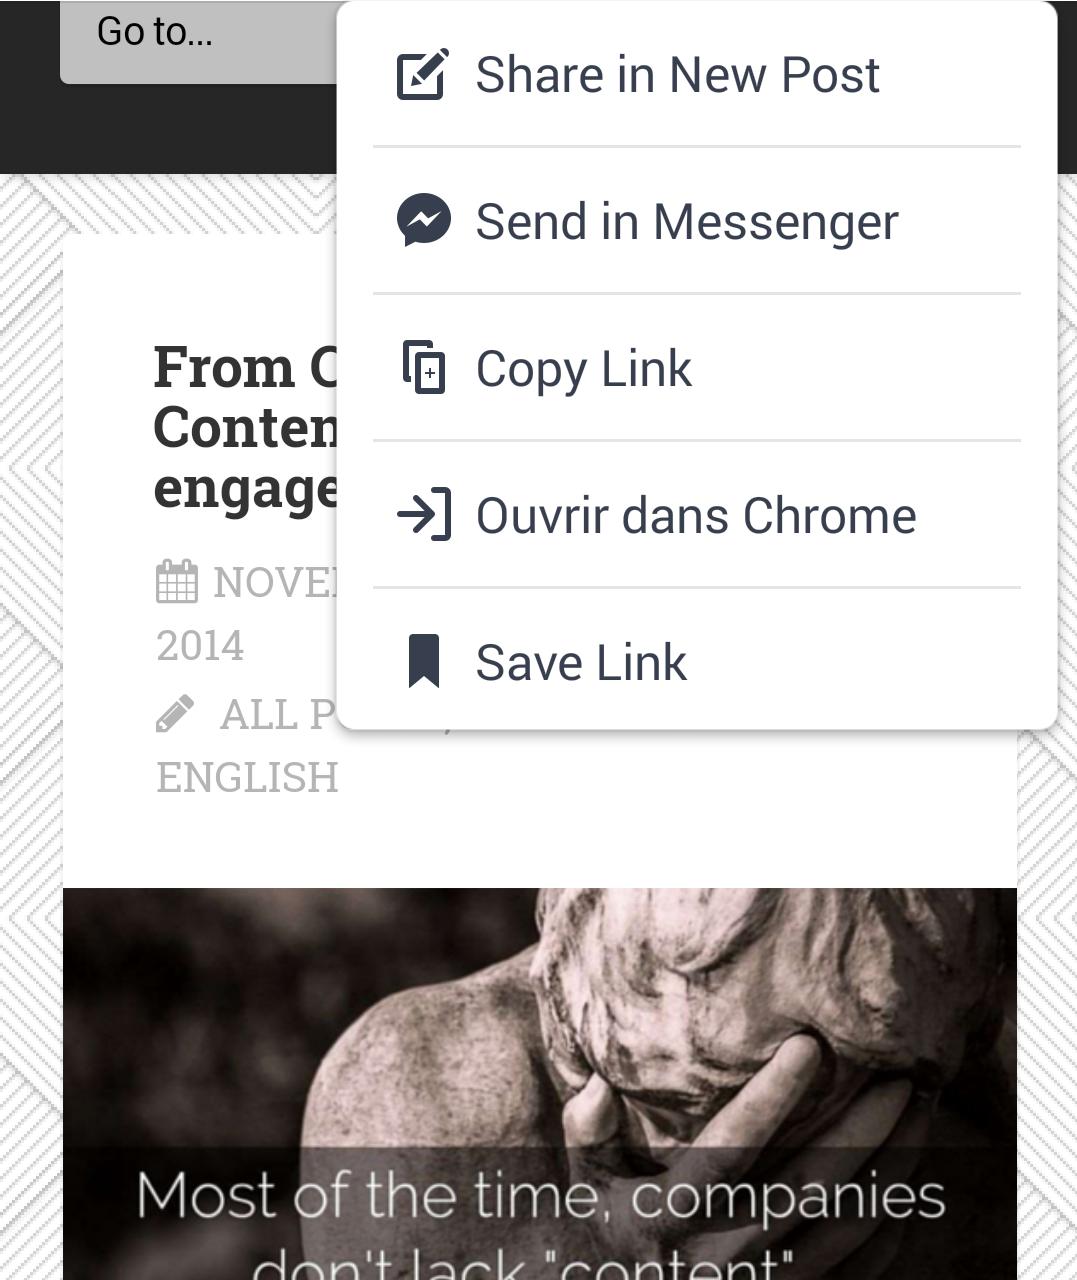 Links opened via the facebook app open in an internal window